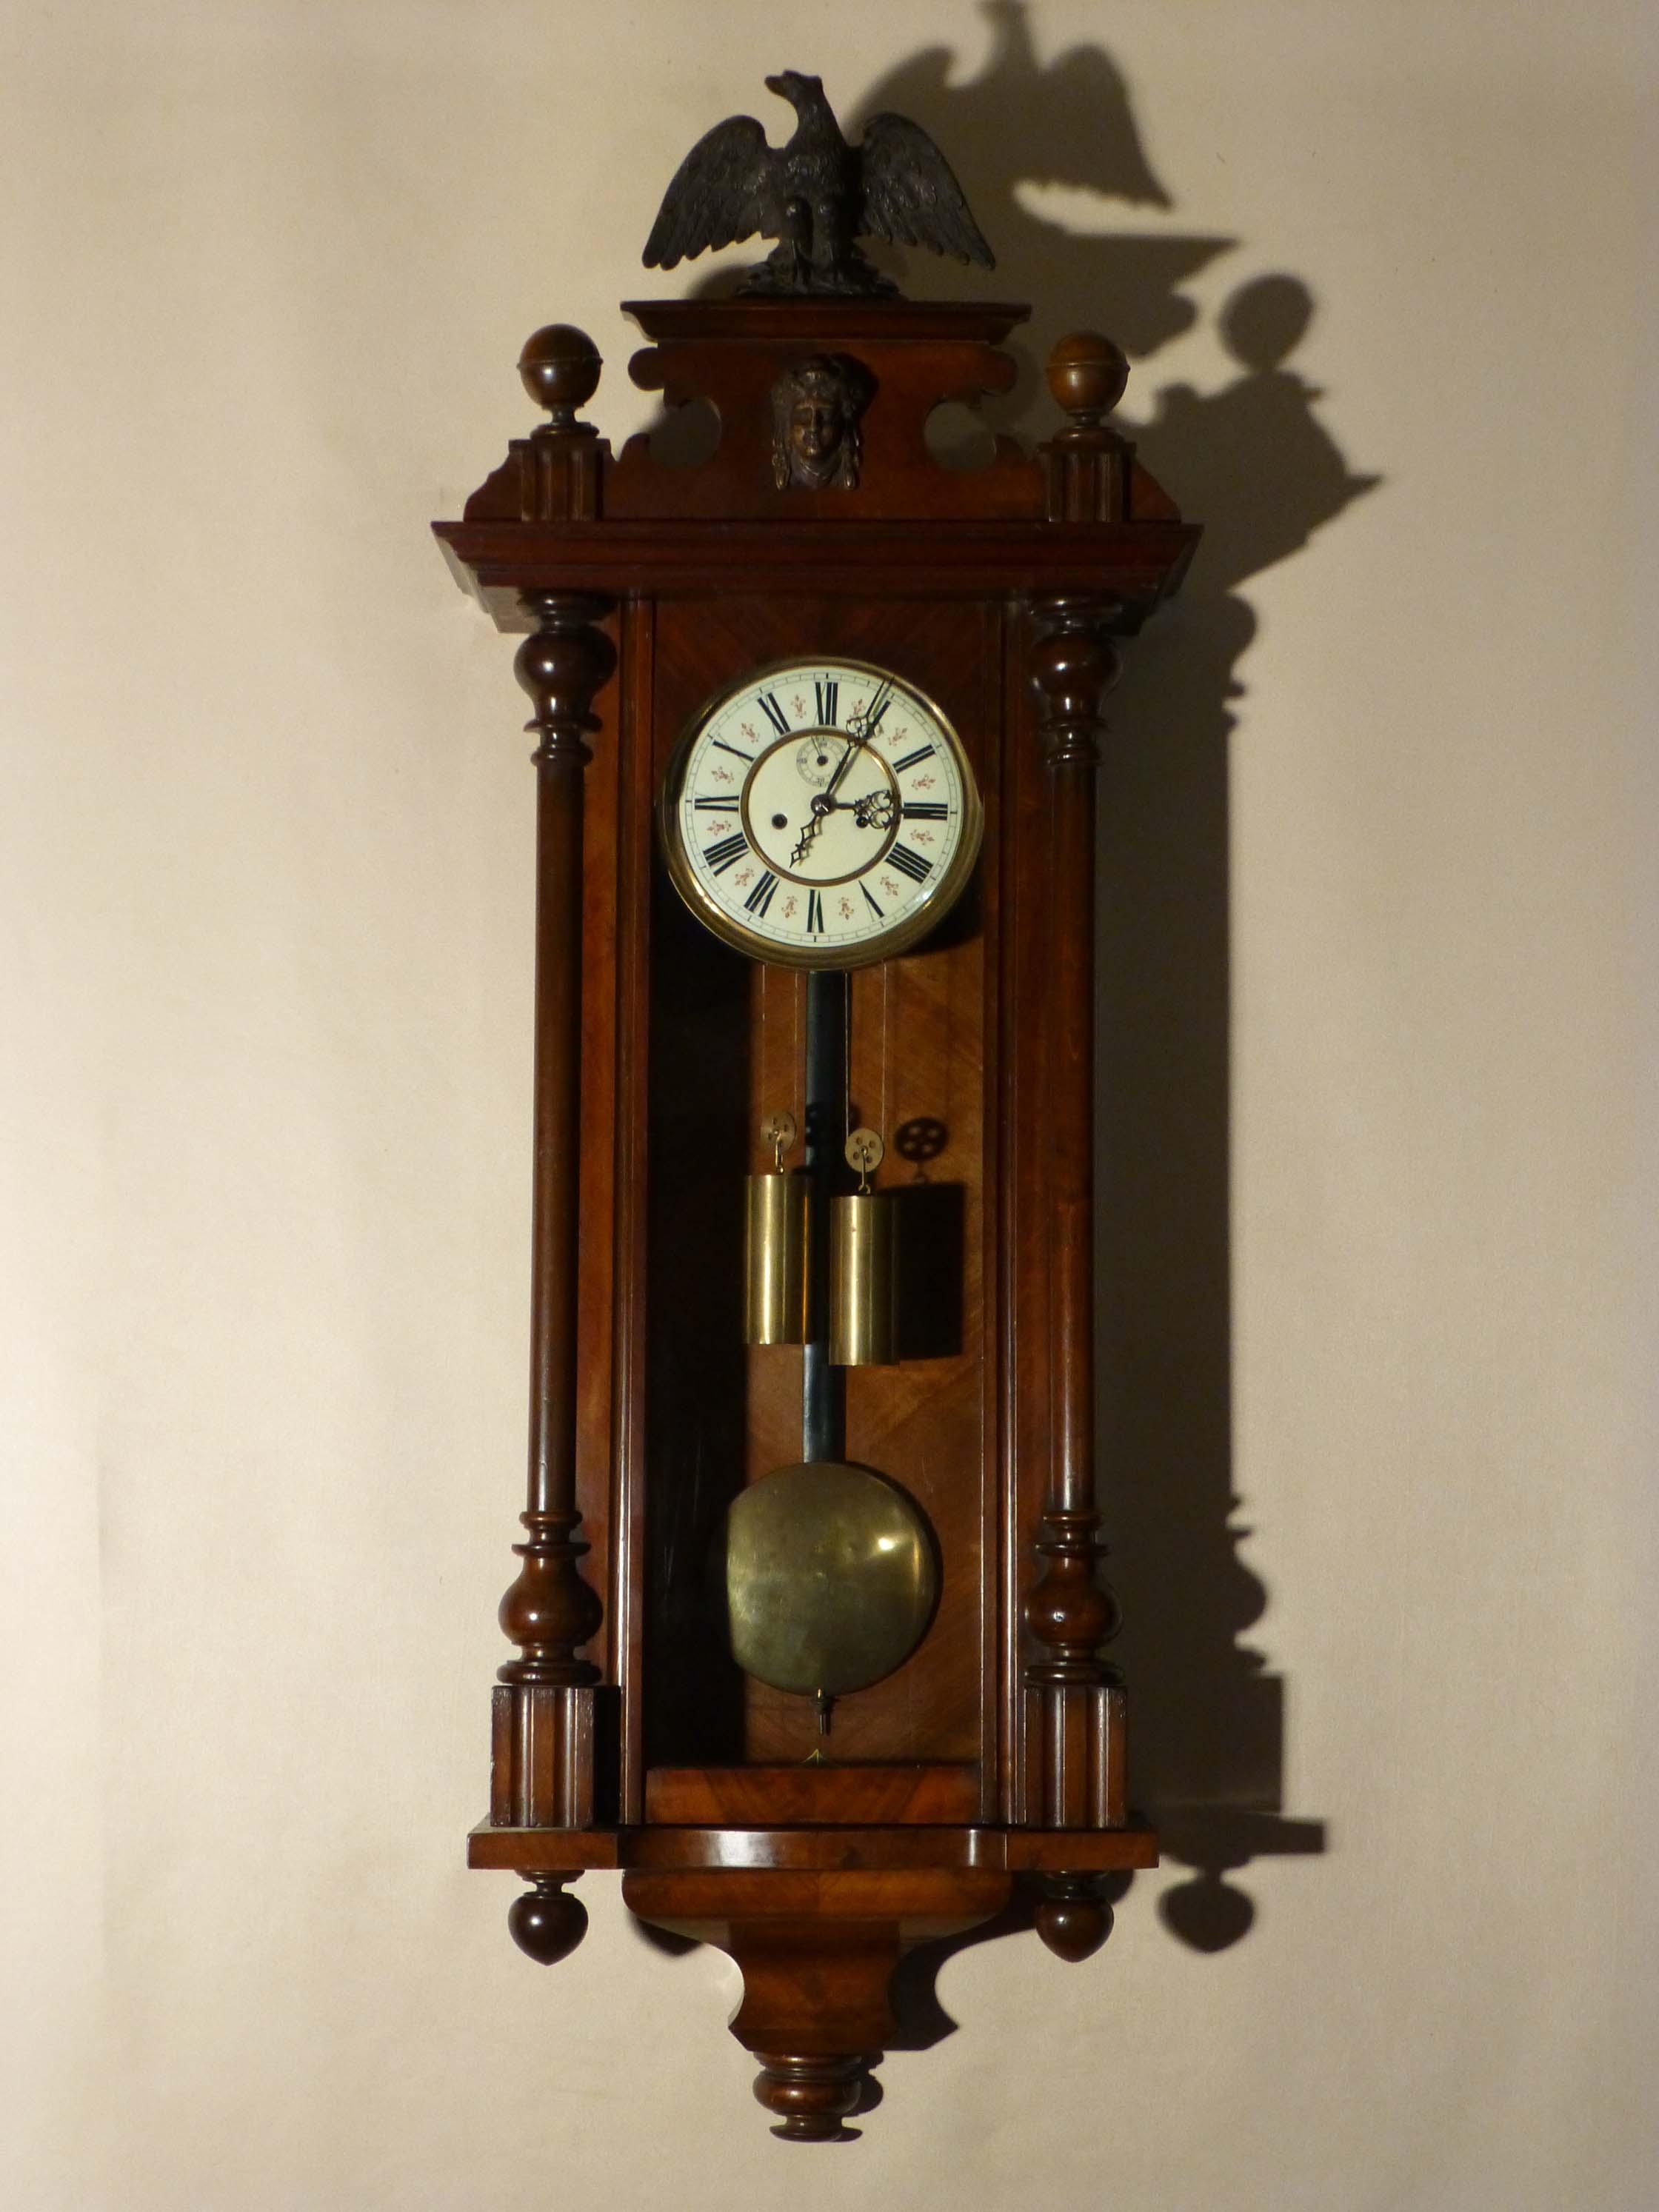 Antique Vienna Regulator Antique Vienna Wall Clock Regulator